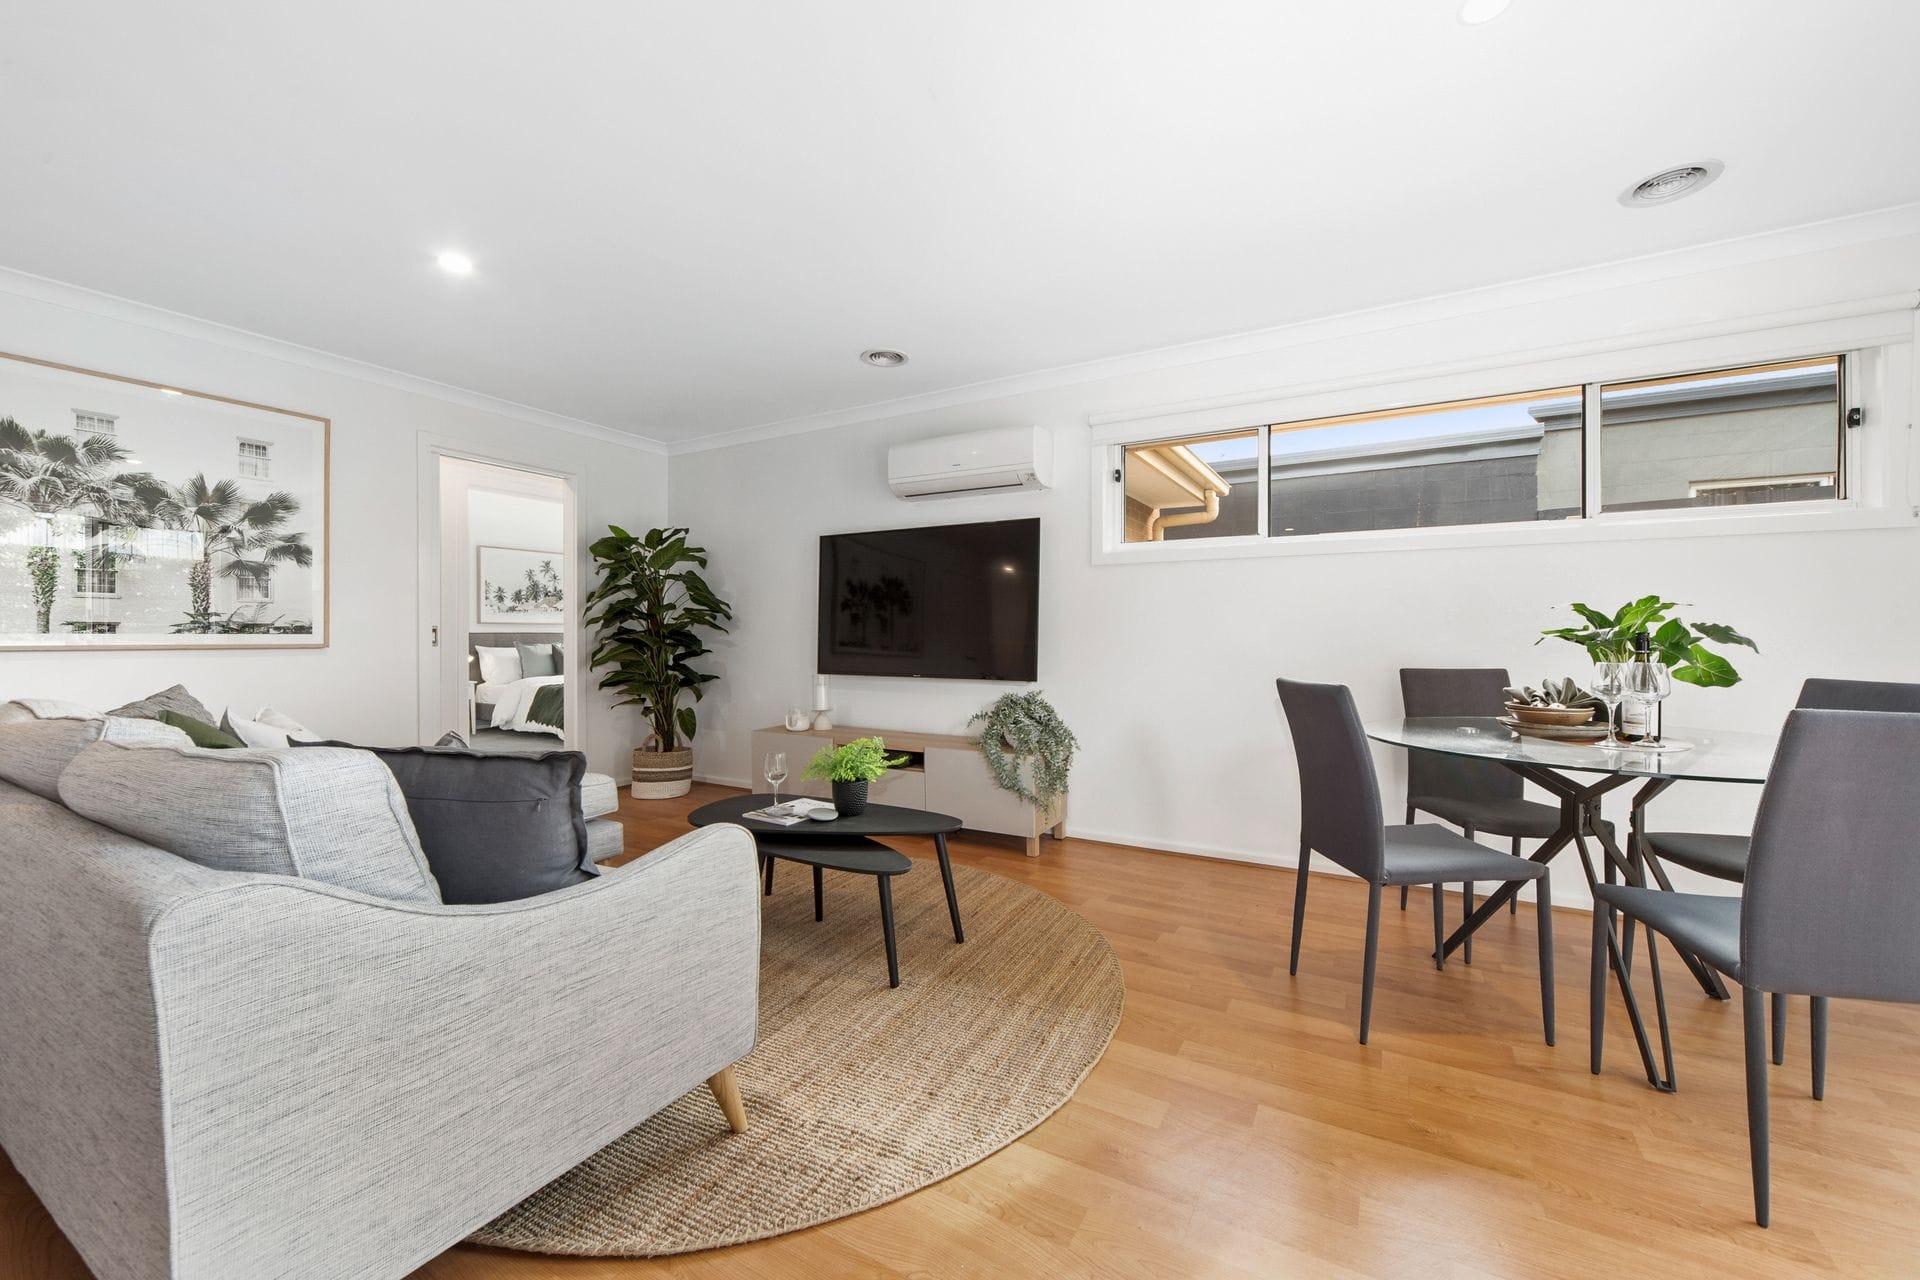 Property 2/165 Fortescue Avenue, Seaford VIC 3198 IMAGE